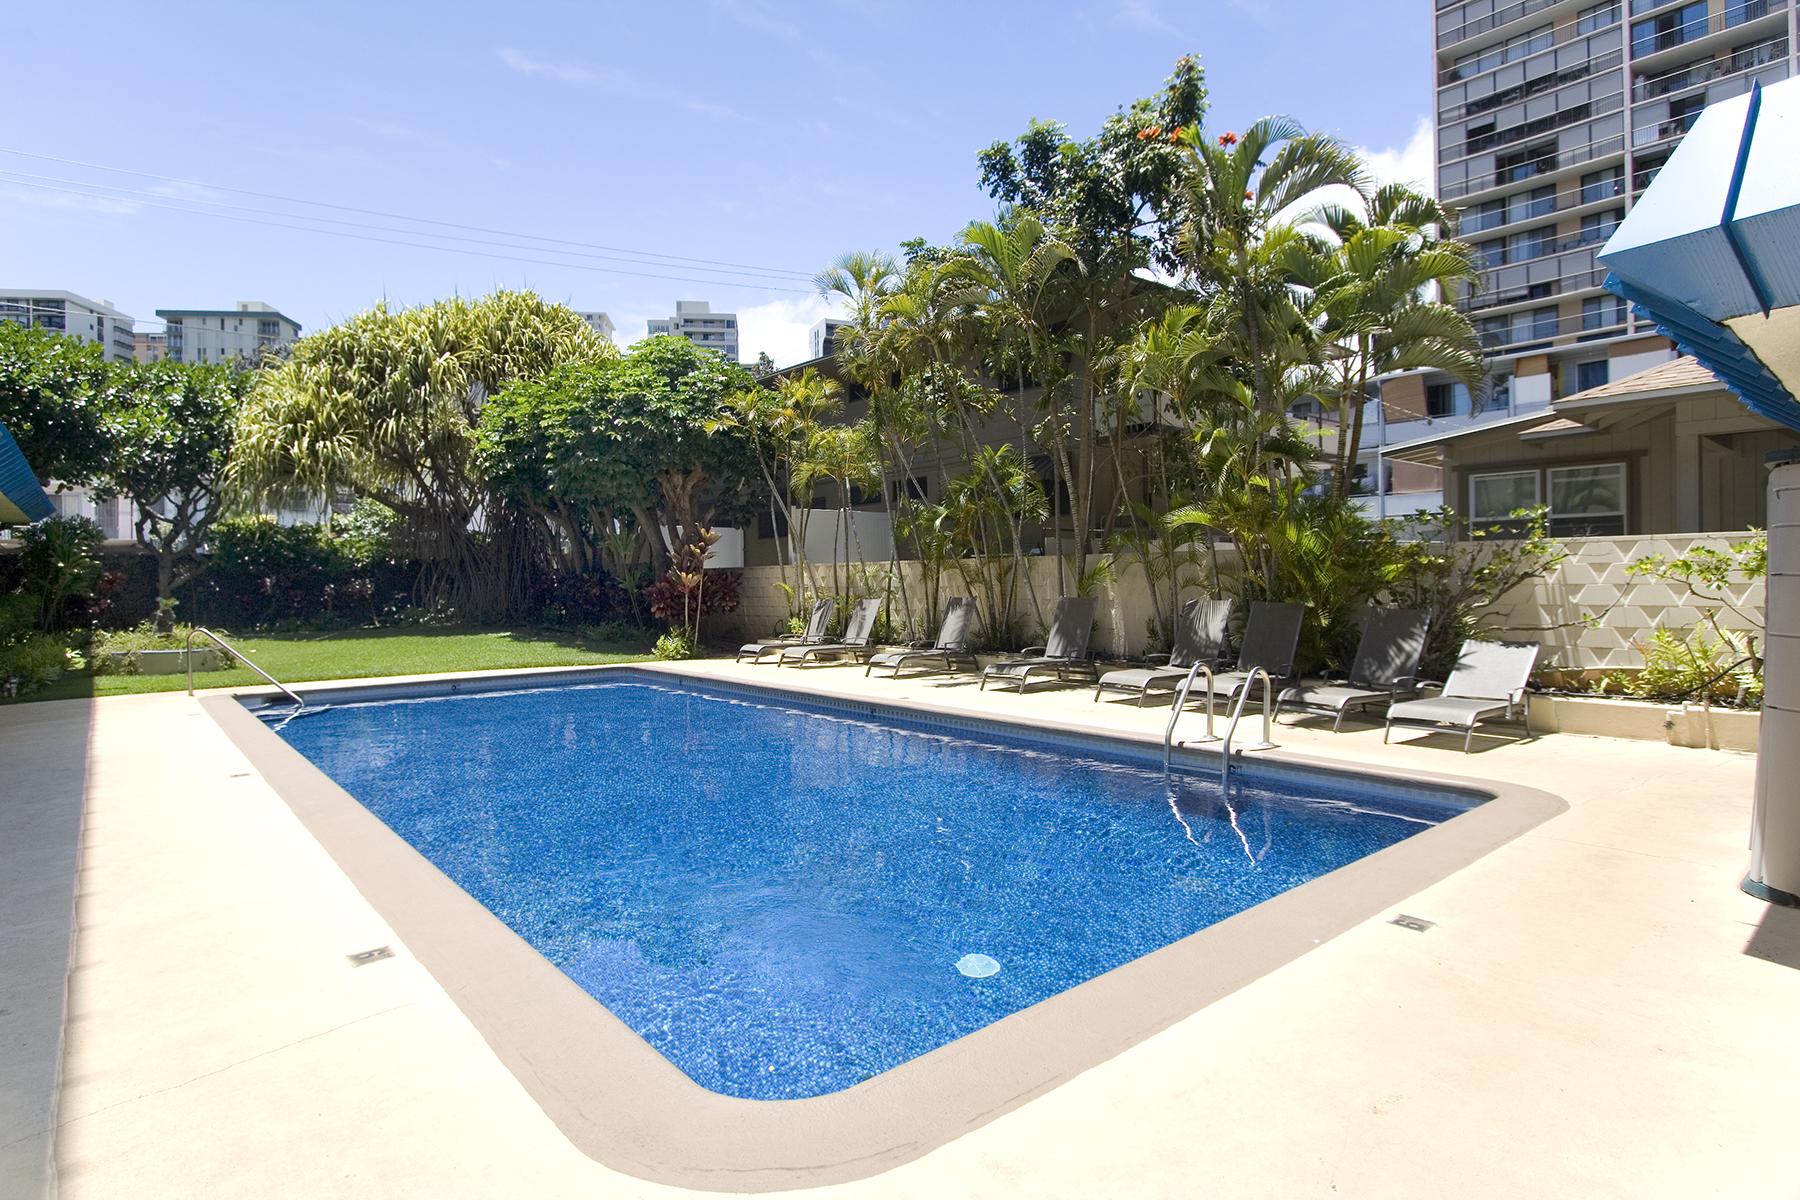 Pool at 1535 Pensacola St #711, Honolulu, HI 96822